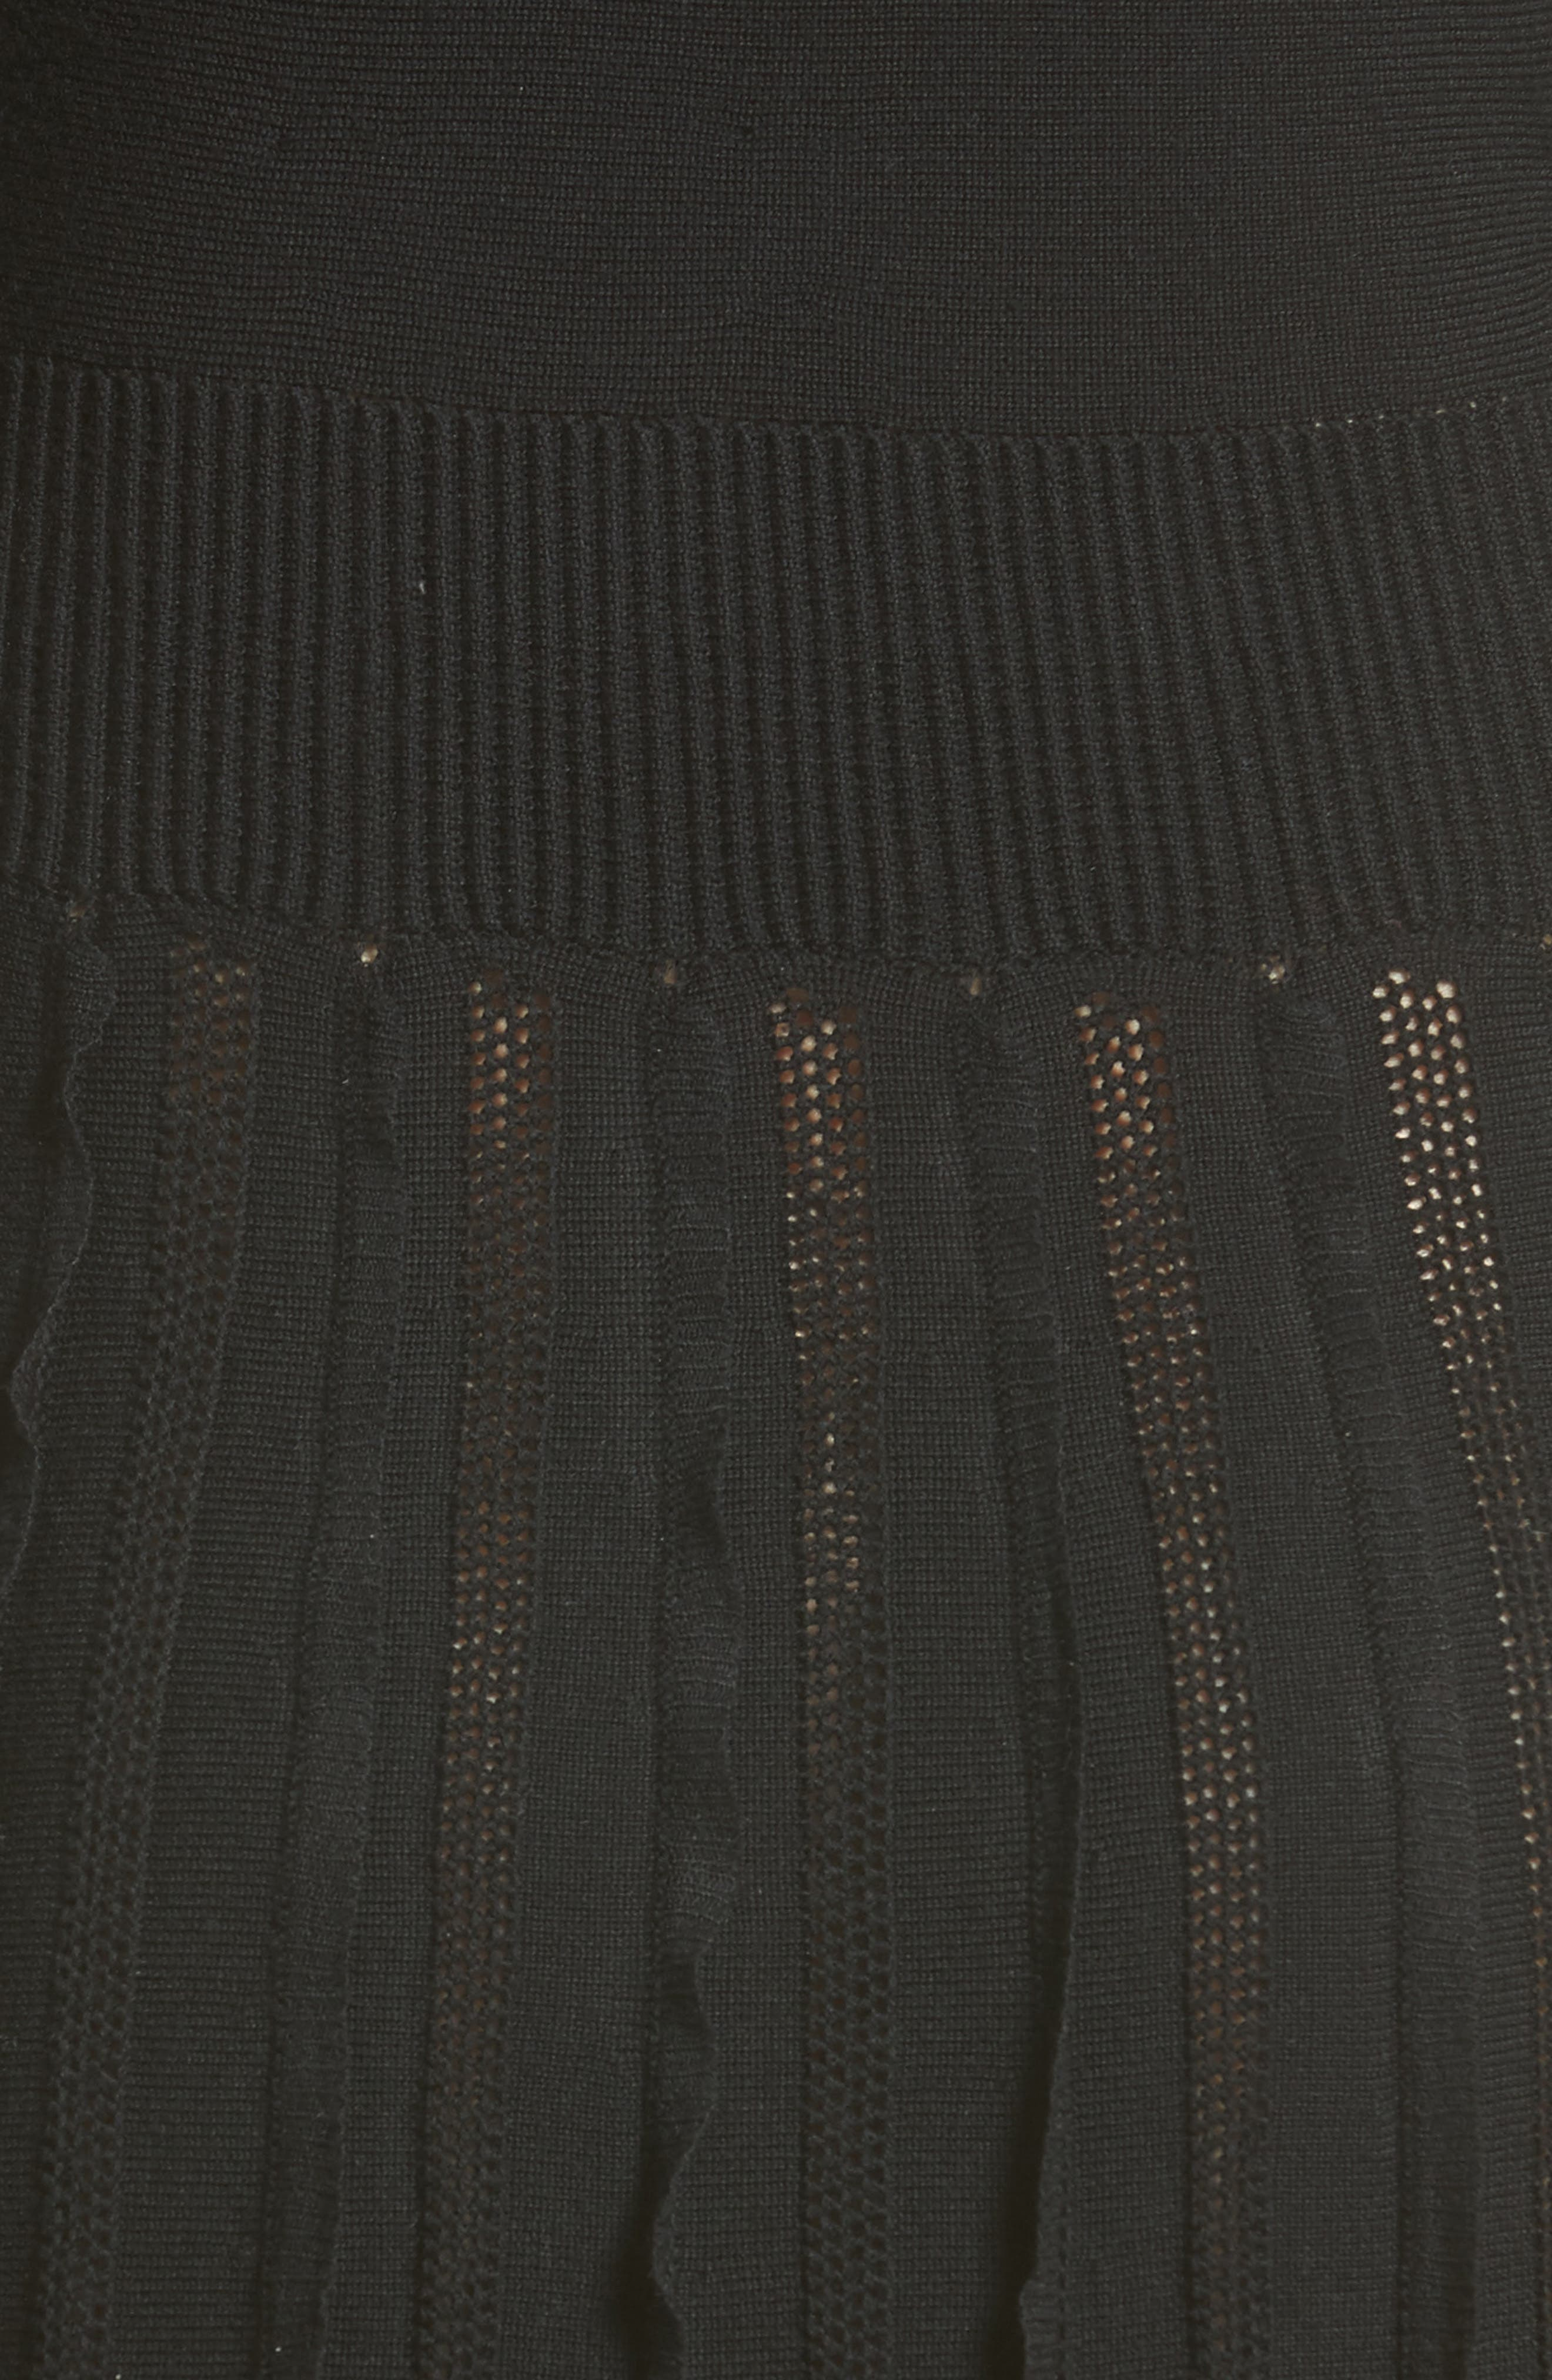 Ruffle Skirt Wool Knit Dress,                             Alternate thumbnail 3, color,                             Black